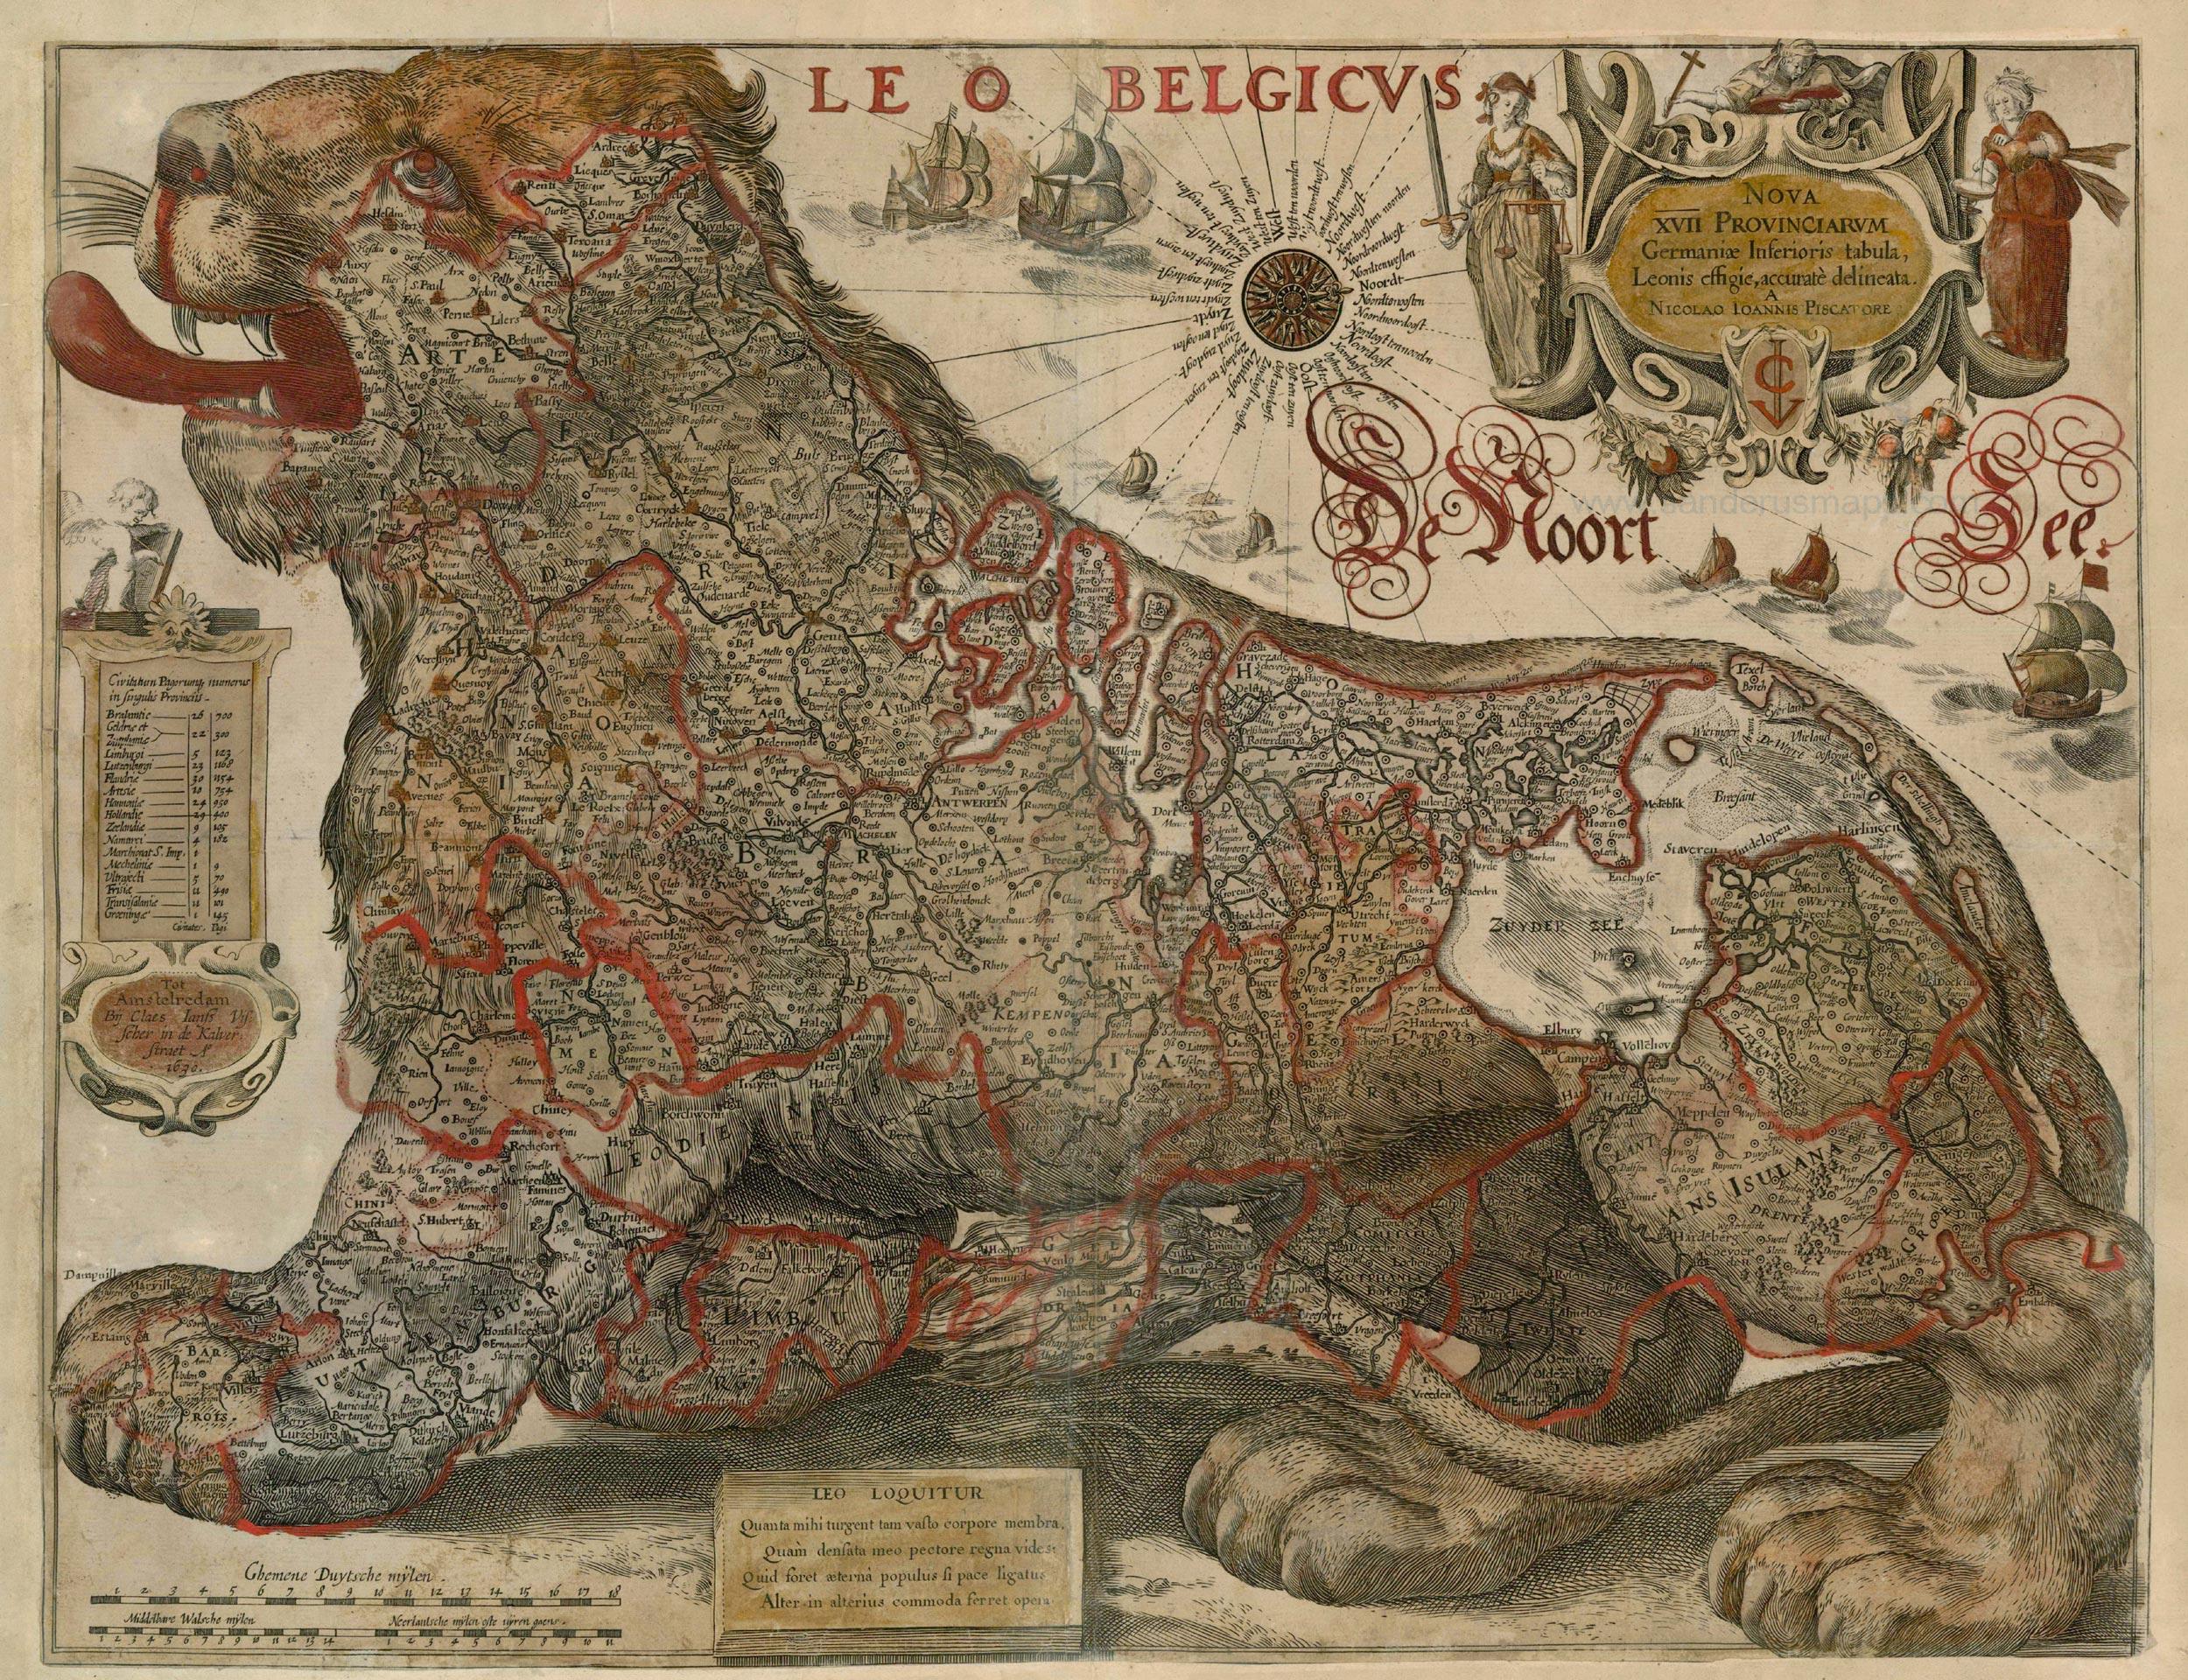 fileantique map of leo belgicus by visscher cj  gerritsz . fileantique map of leo belgicus by visscher cj  gerritsz